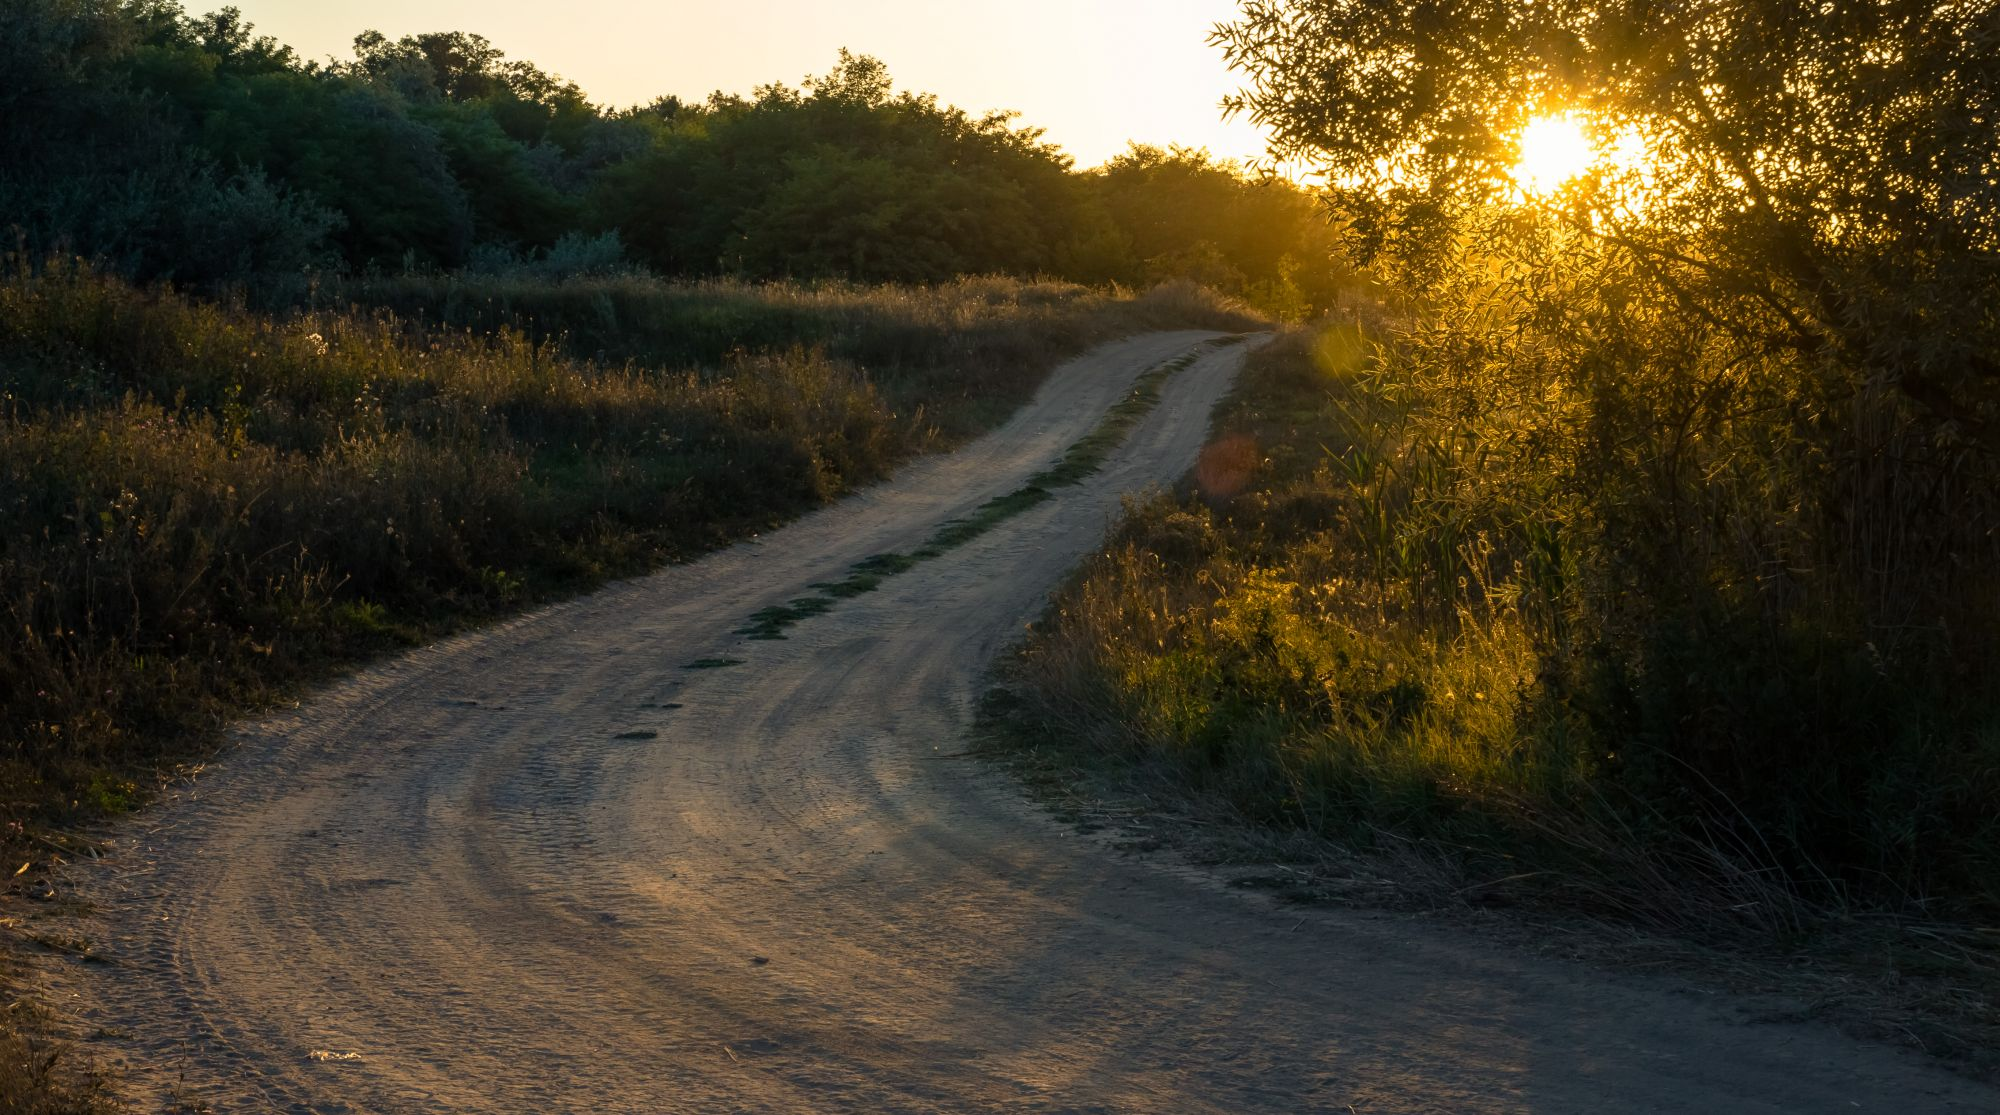 фото дорога к солнцу